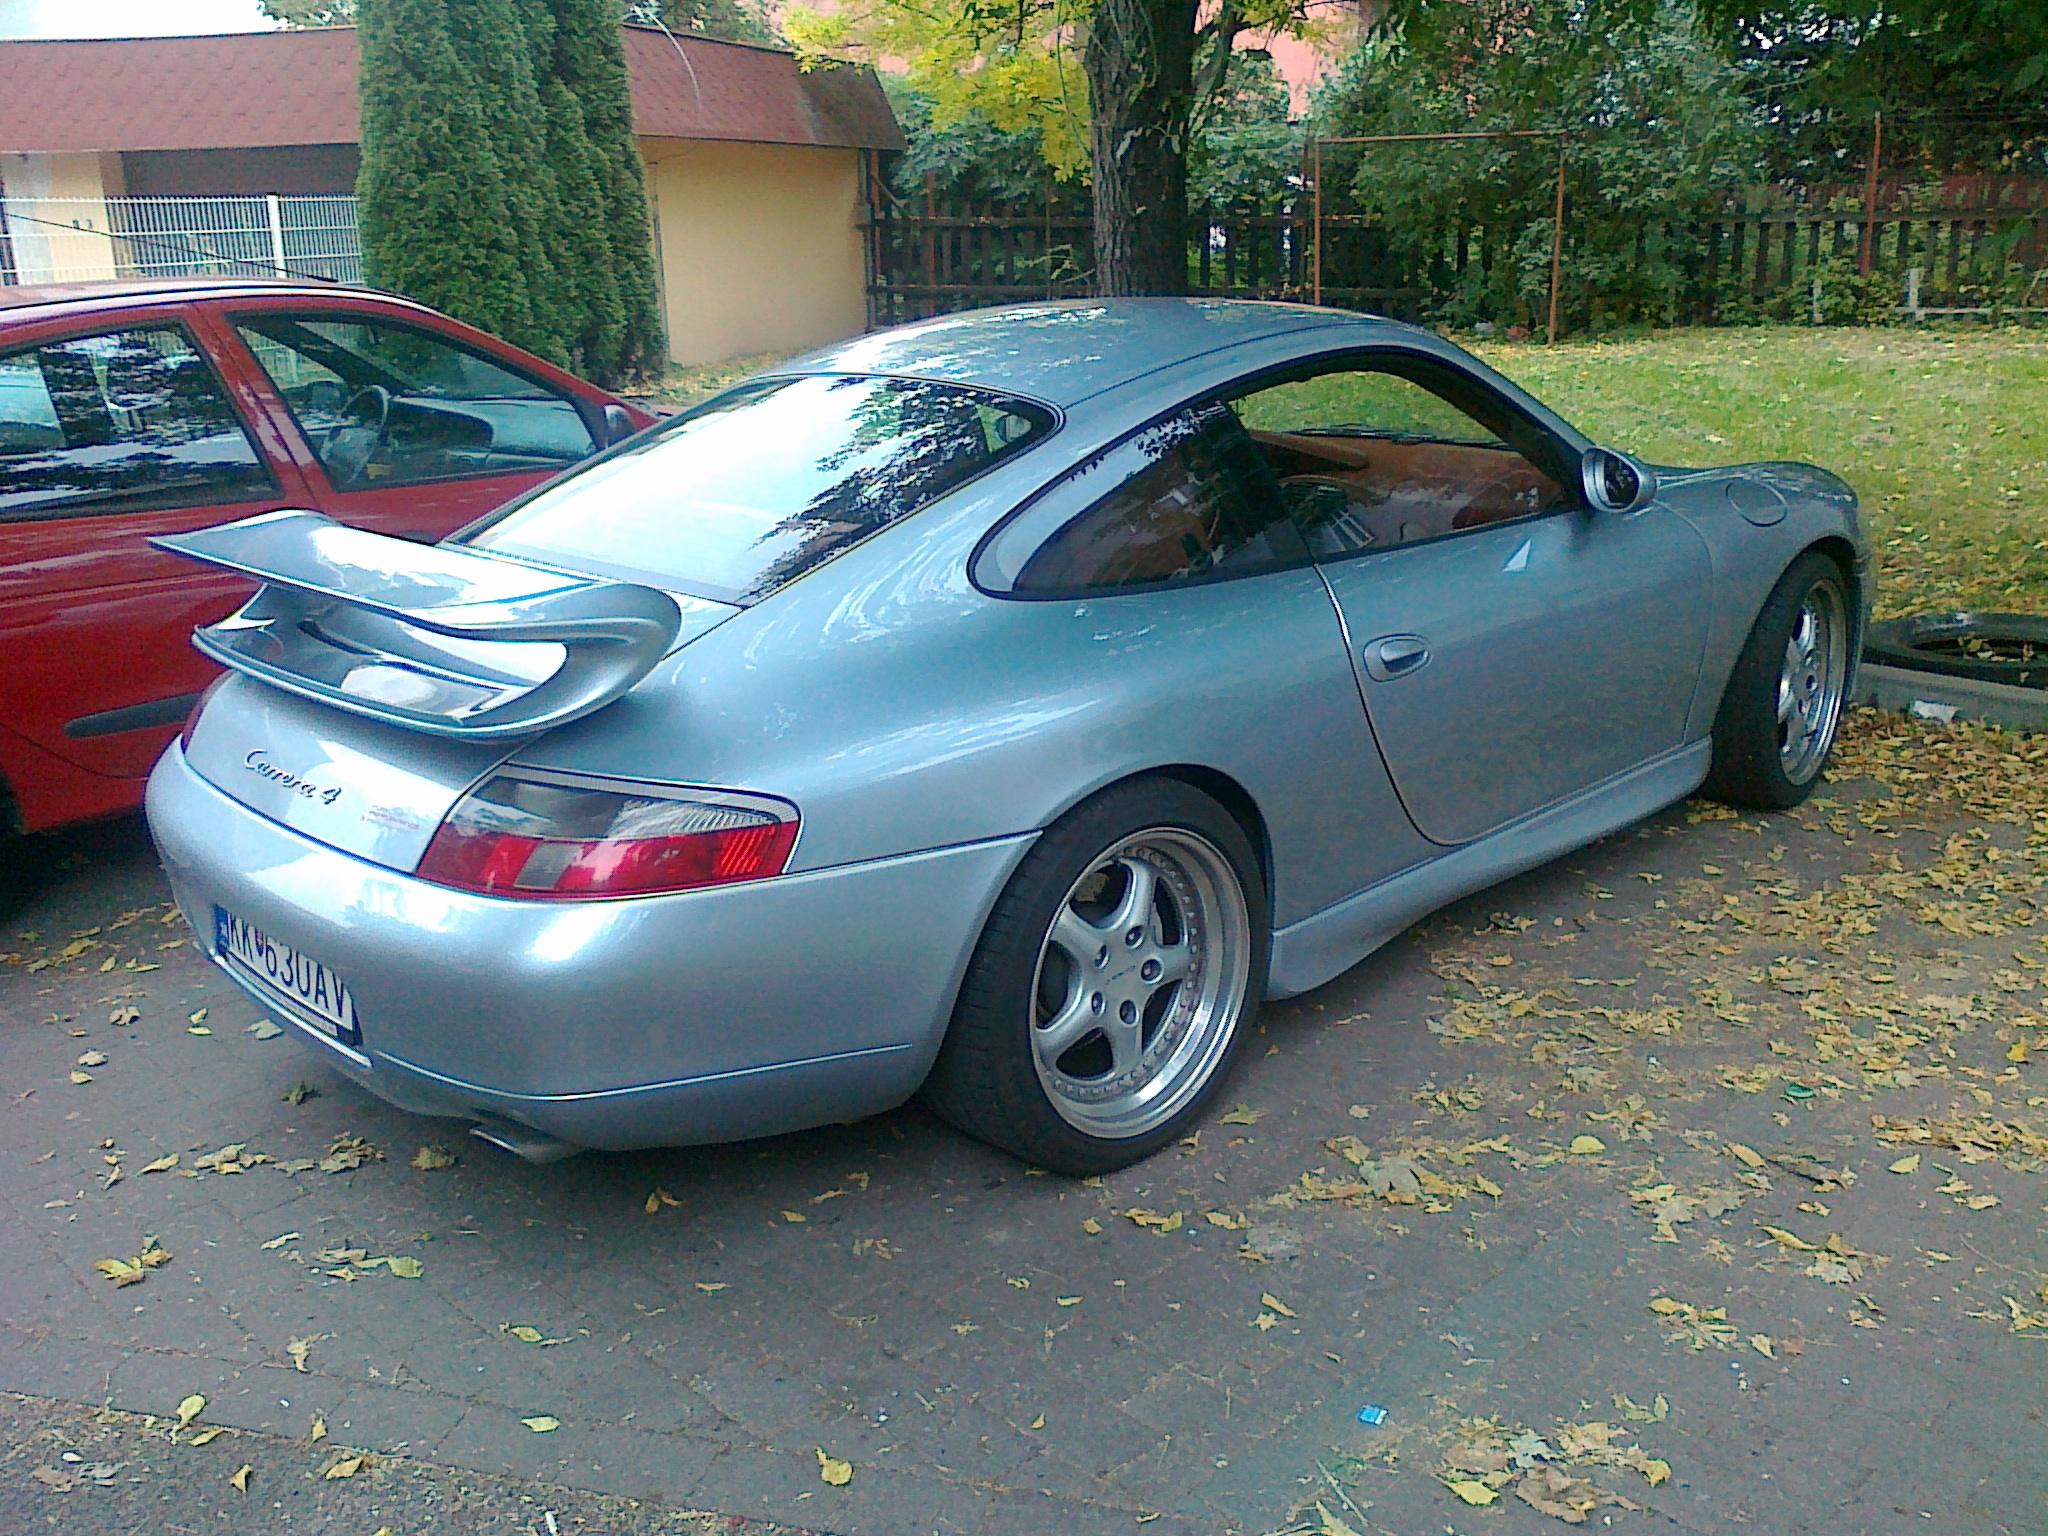 File Porsche Carrera 911 996 Jpg Wikimedia Commons